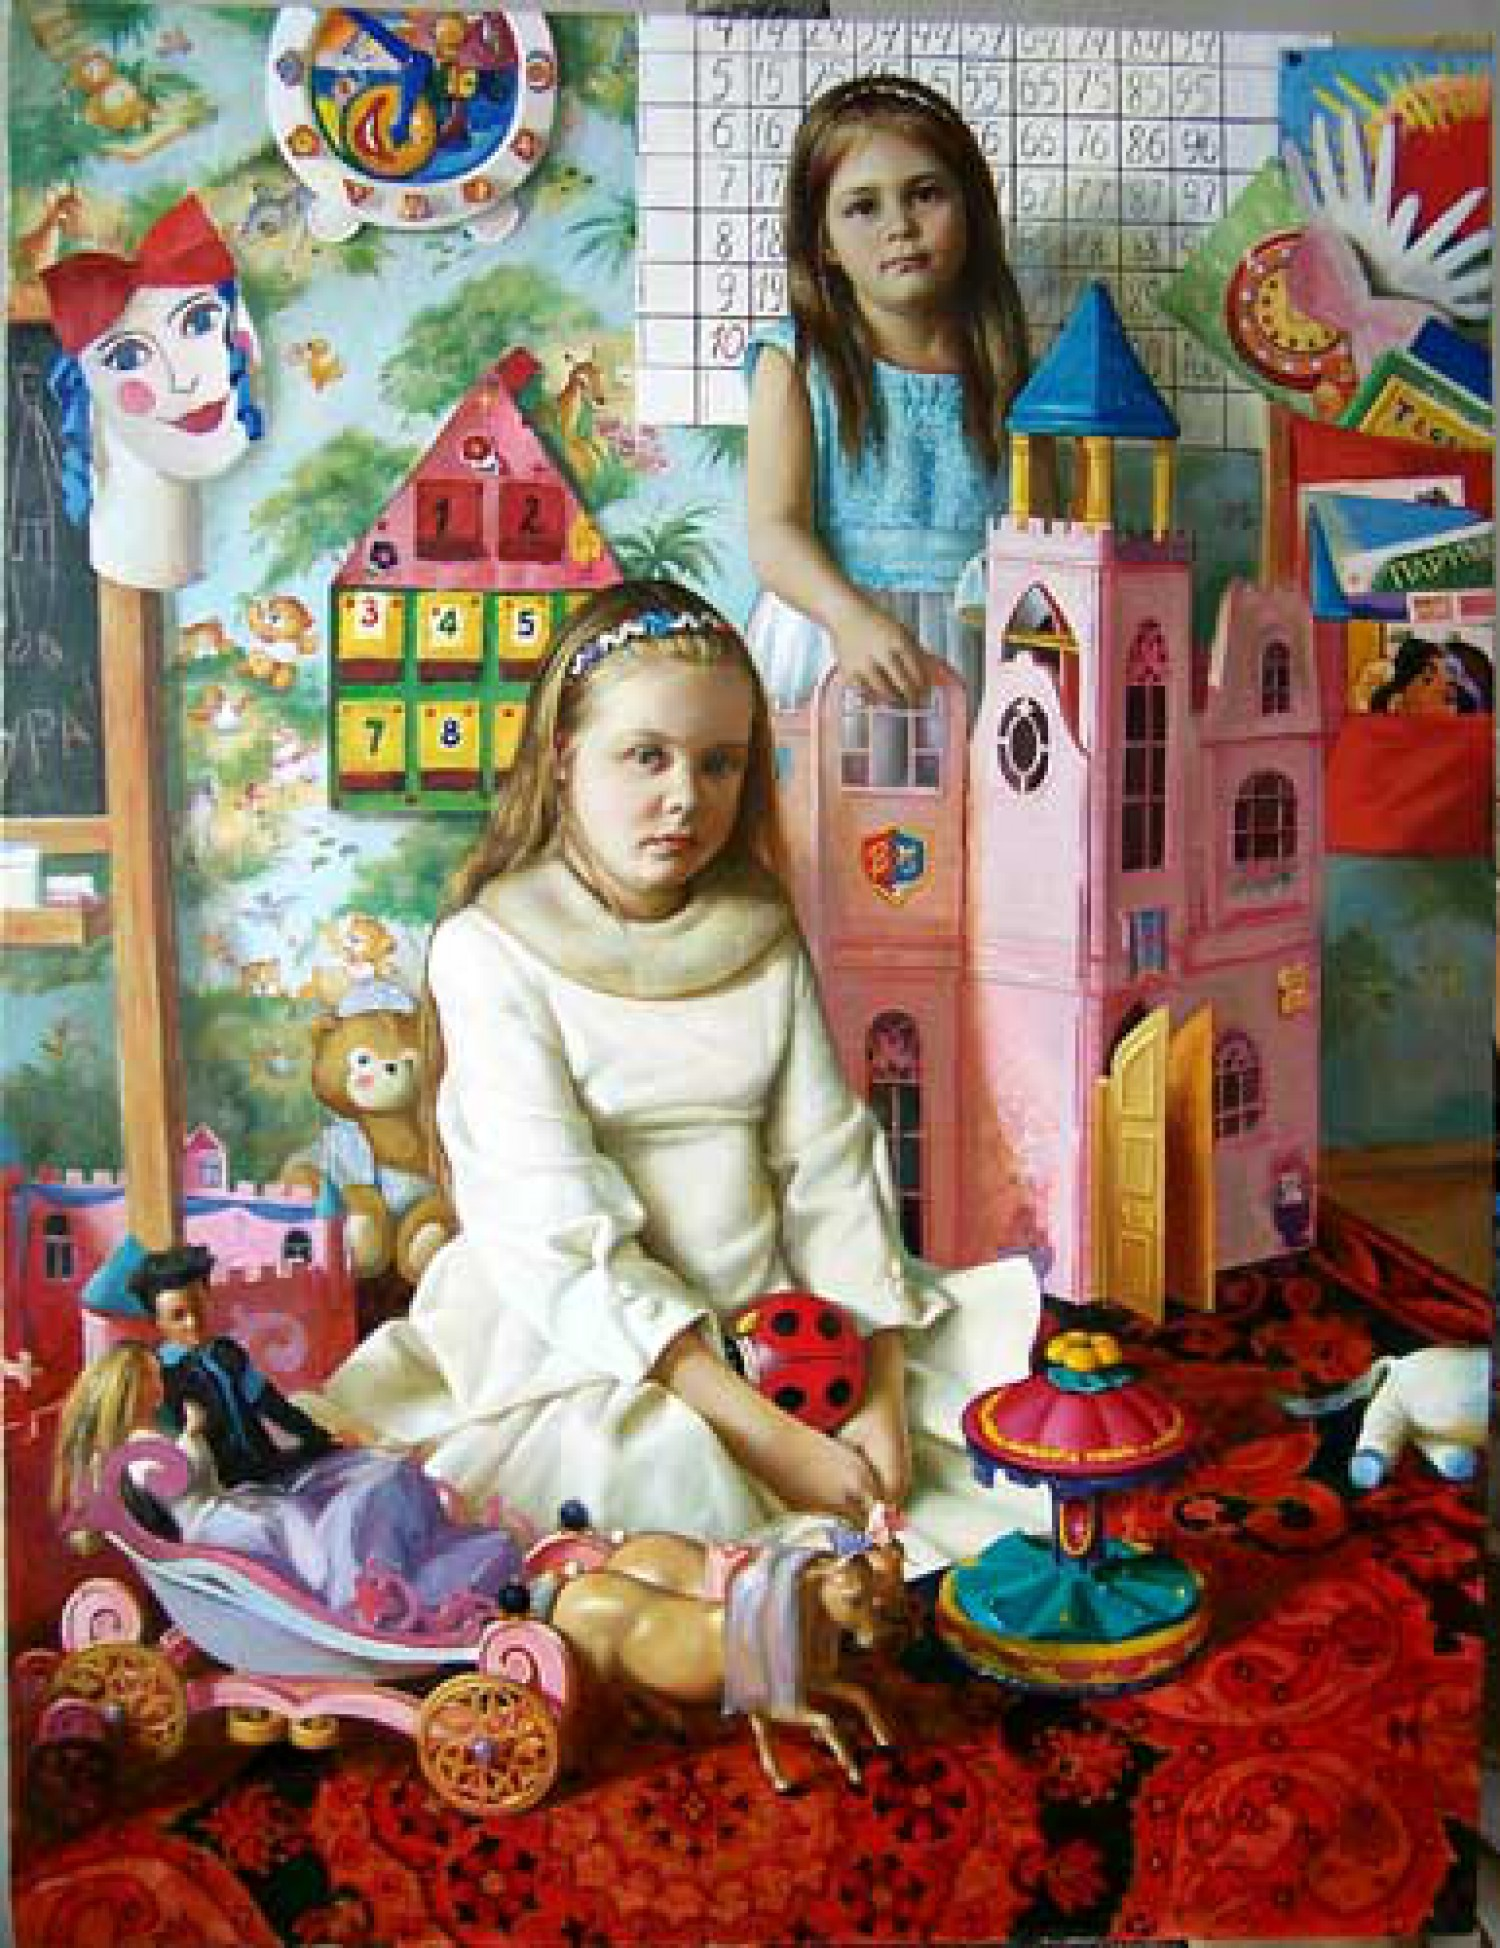 С.Н.Соколов. Две сестры. Х.м, акрил. 130х100. 2007 г.